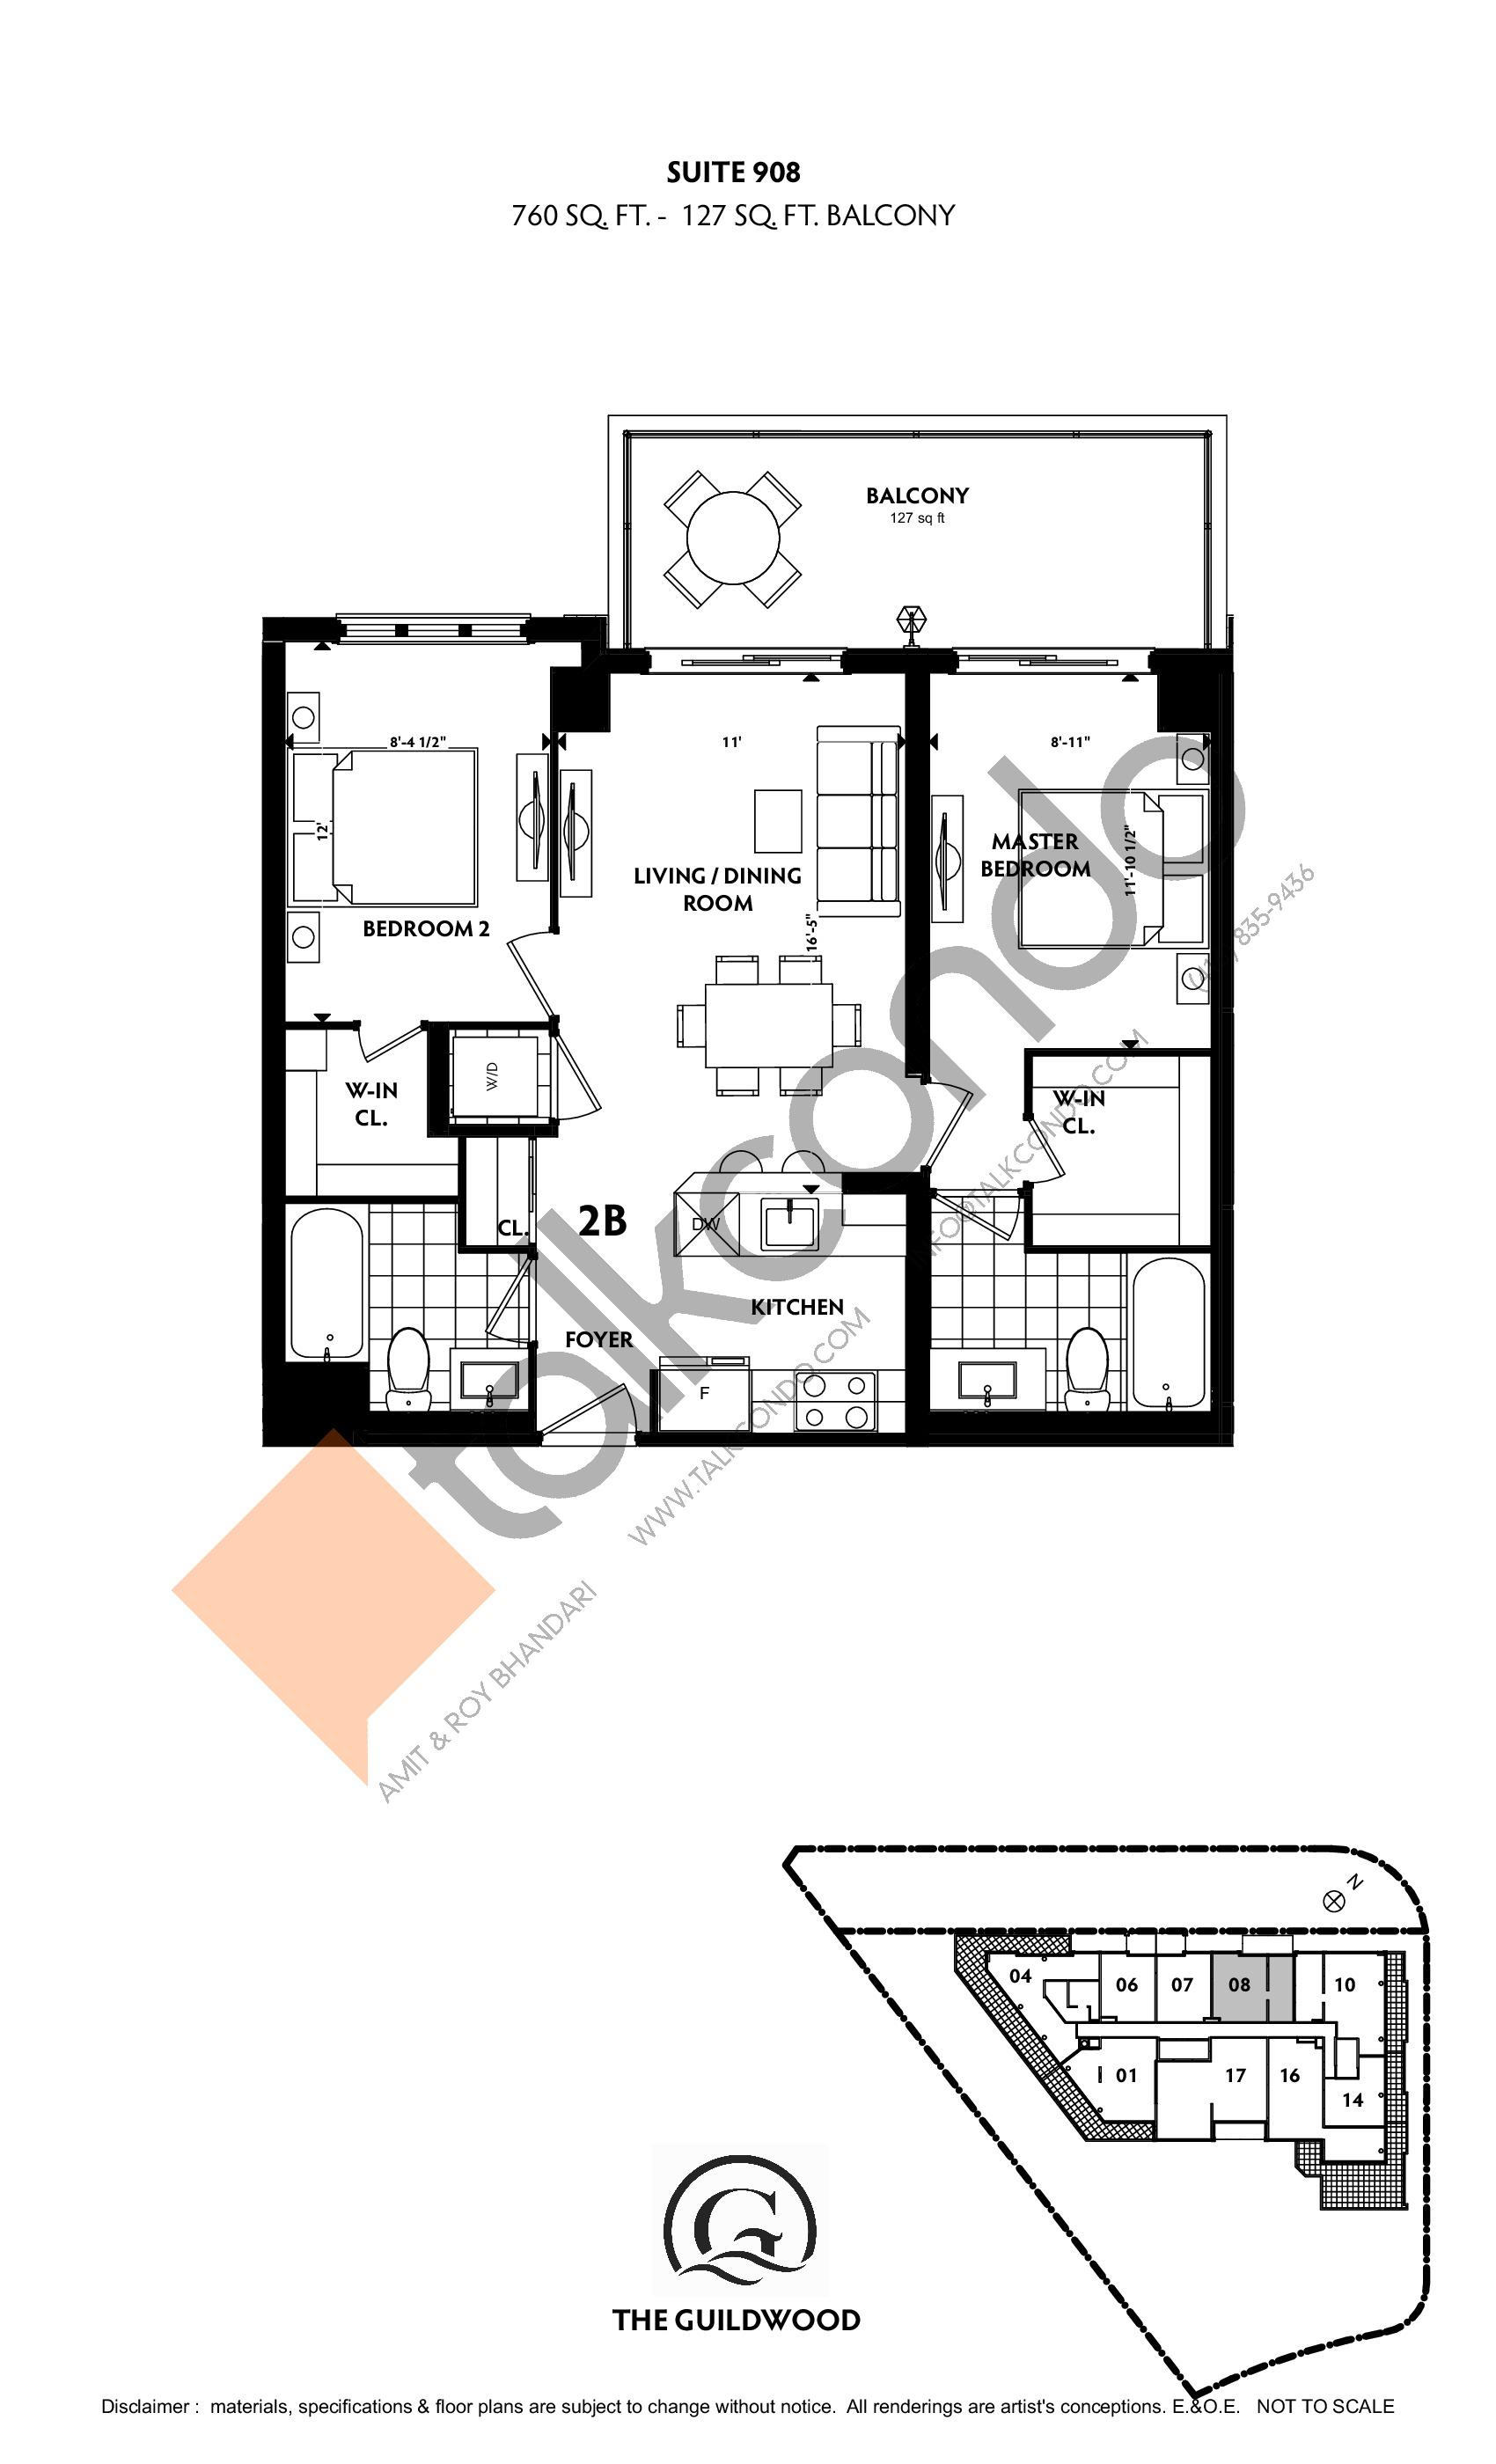 Suite 908 Floor Plan at Guildwood Condos - 760 sq.ft